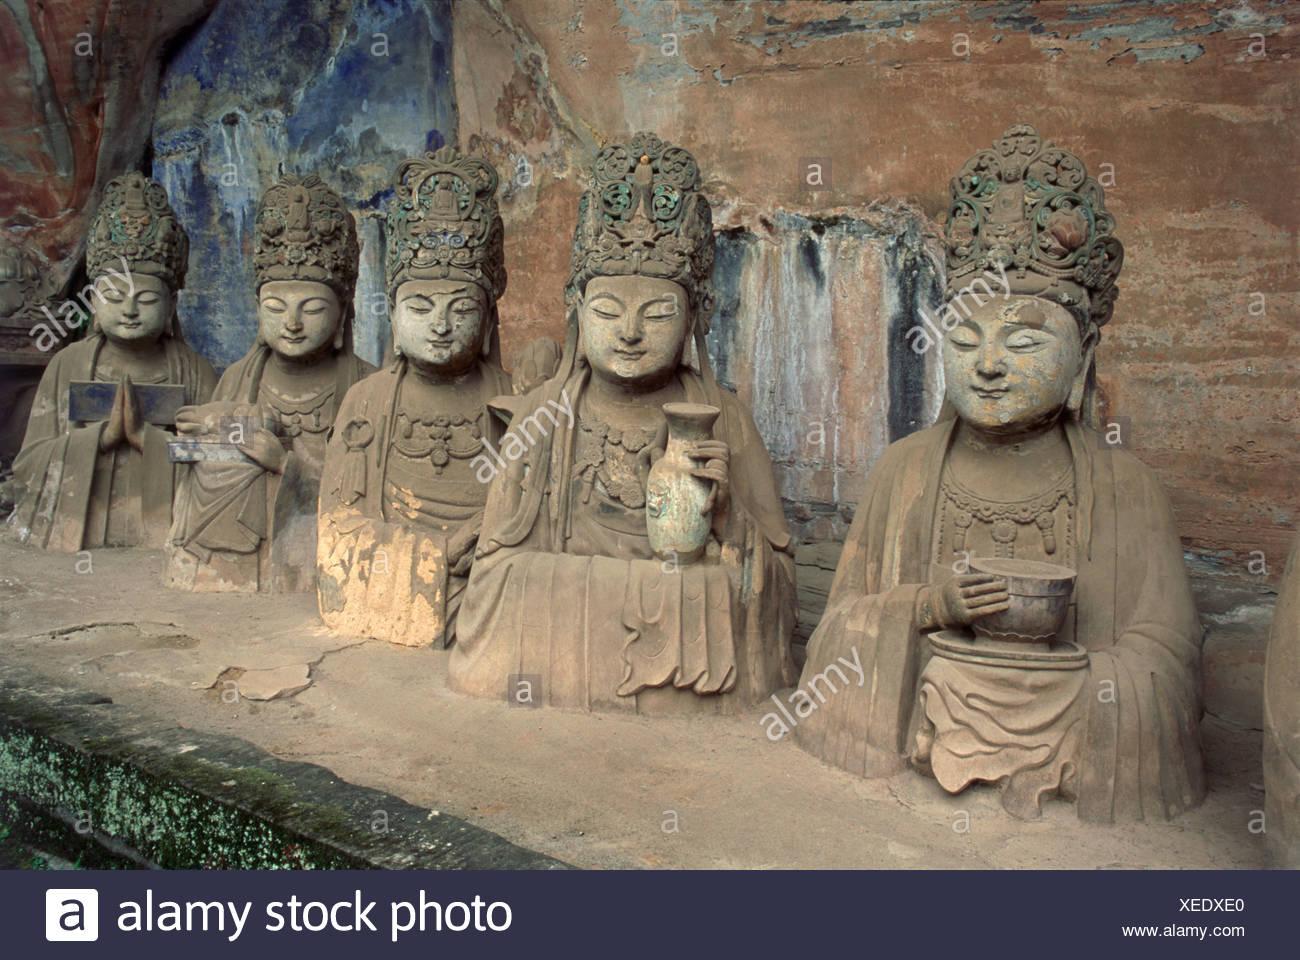 China, Sichuan, Dazu, Baoding Shan, Cave 11, Reclining Buddha, life-like busts of officials donors in meditation below Buddha - Stock Image